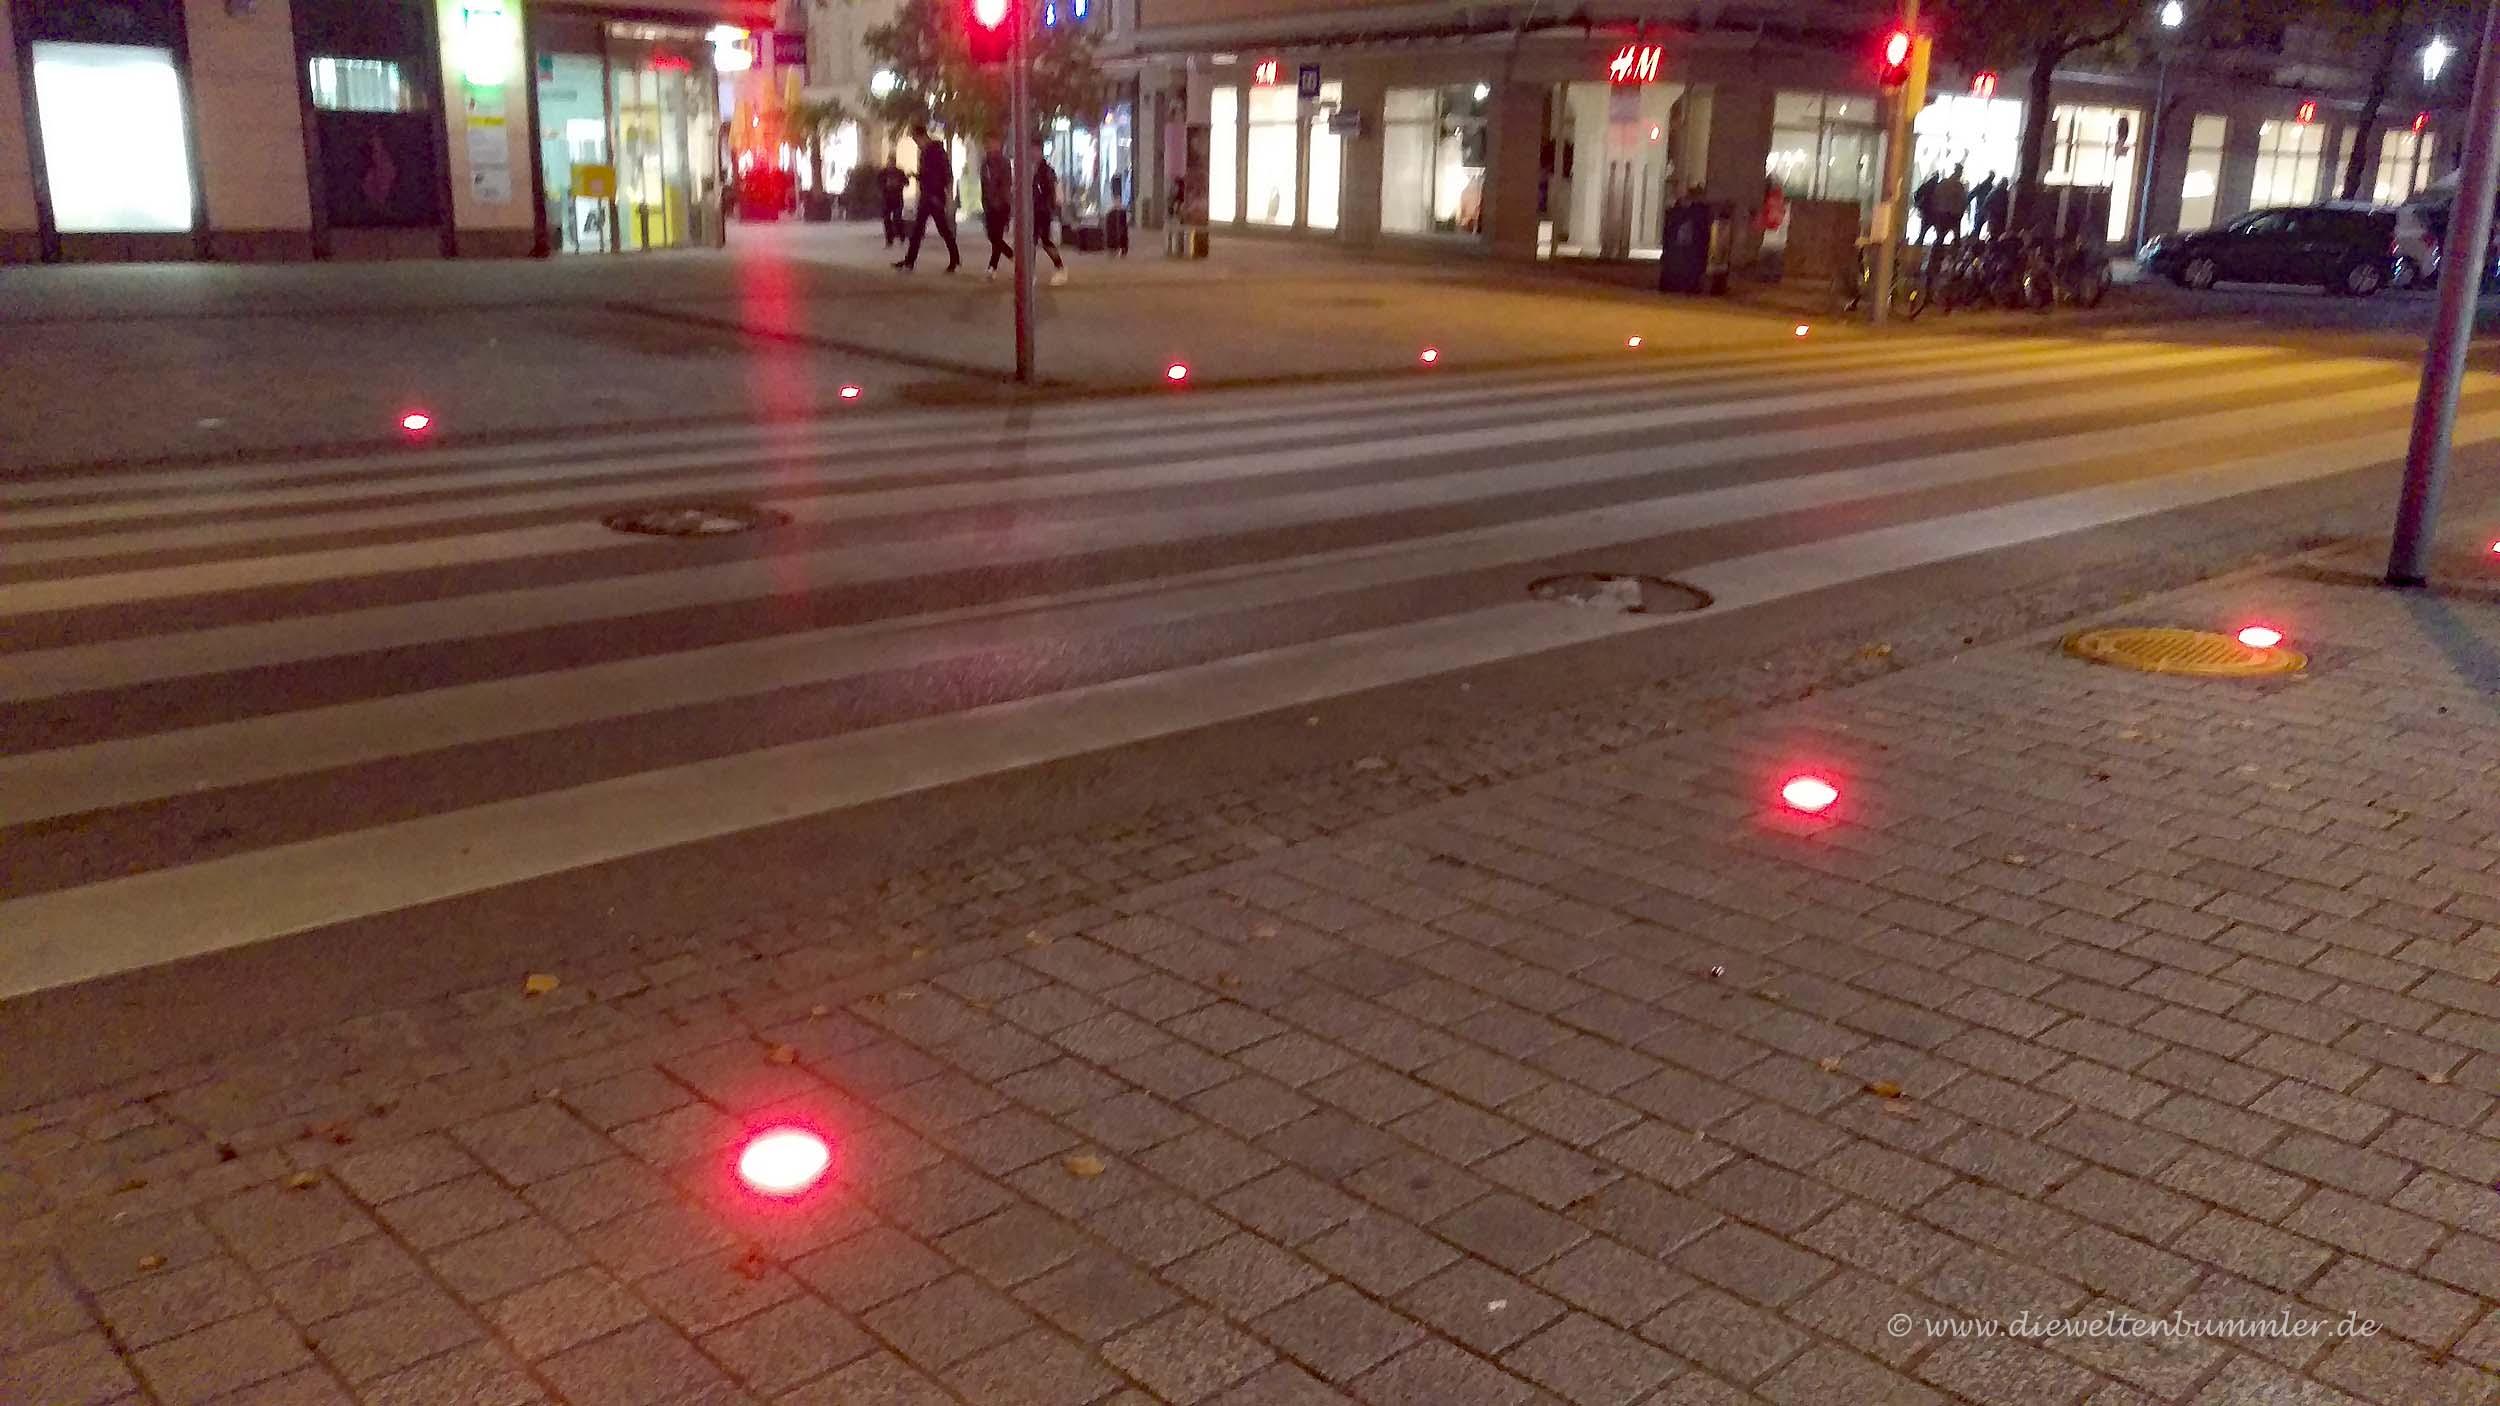 Rote Ampel im Boden